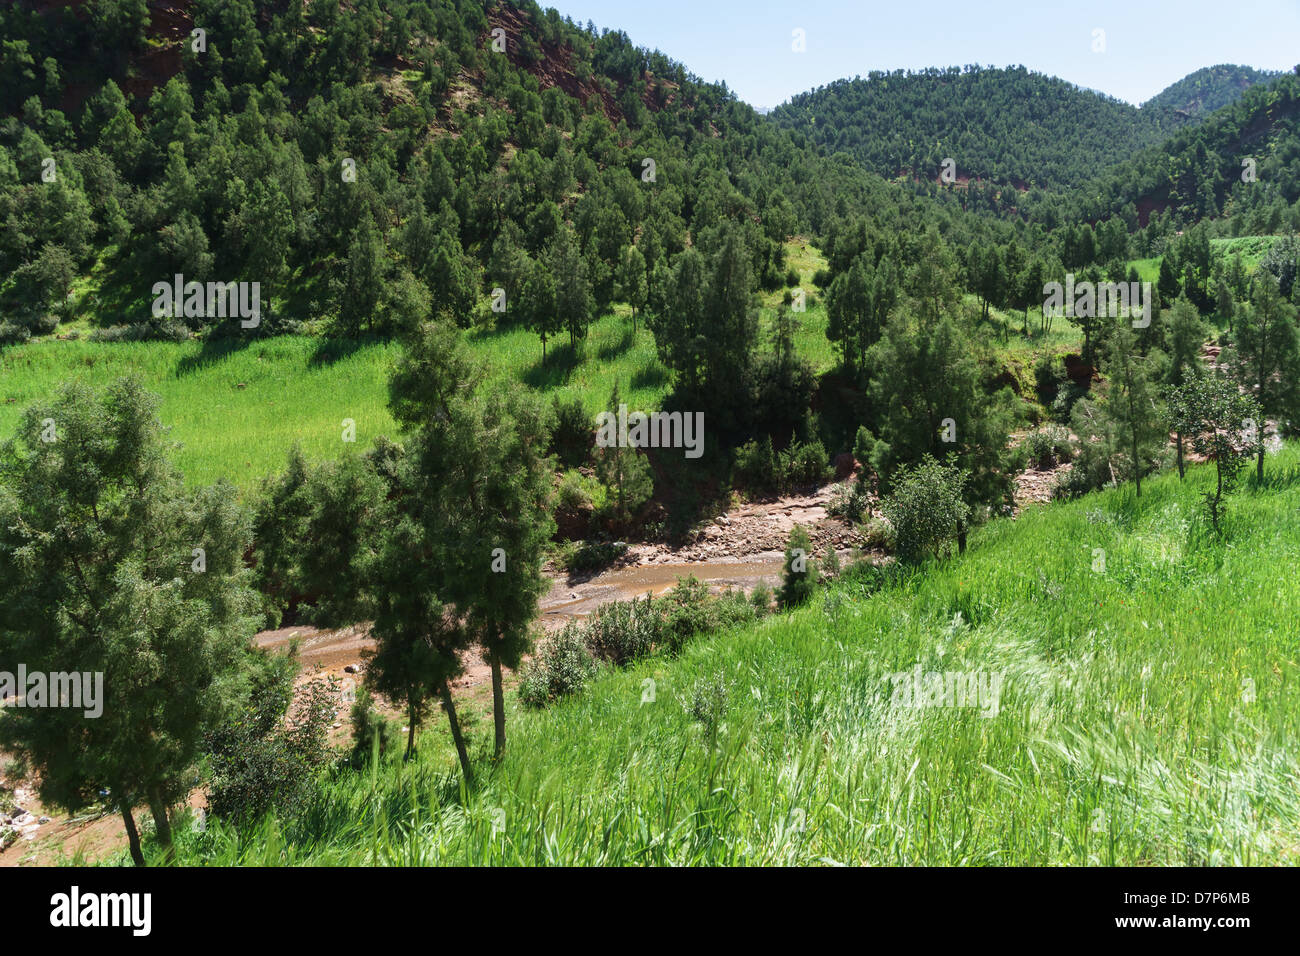 Morocco, Marrakesh - Ourika river valley, - Stock Image